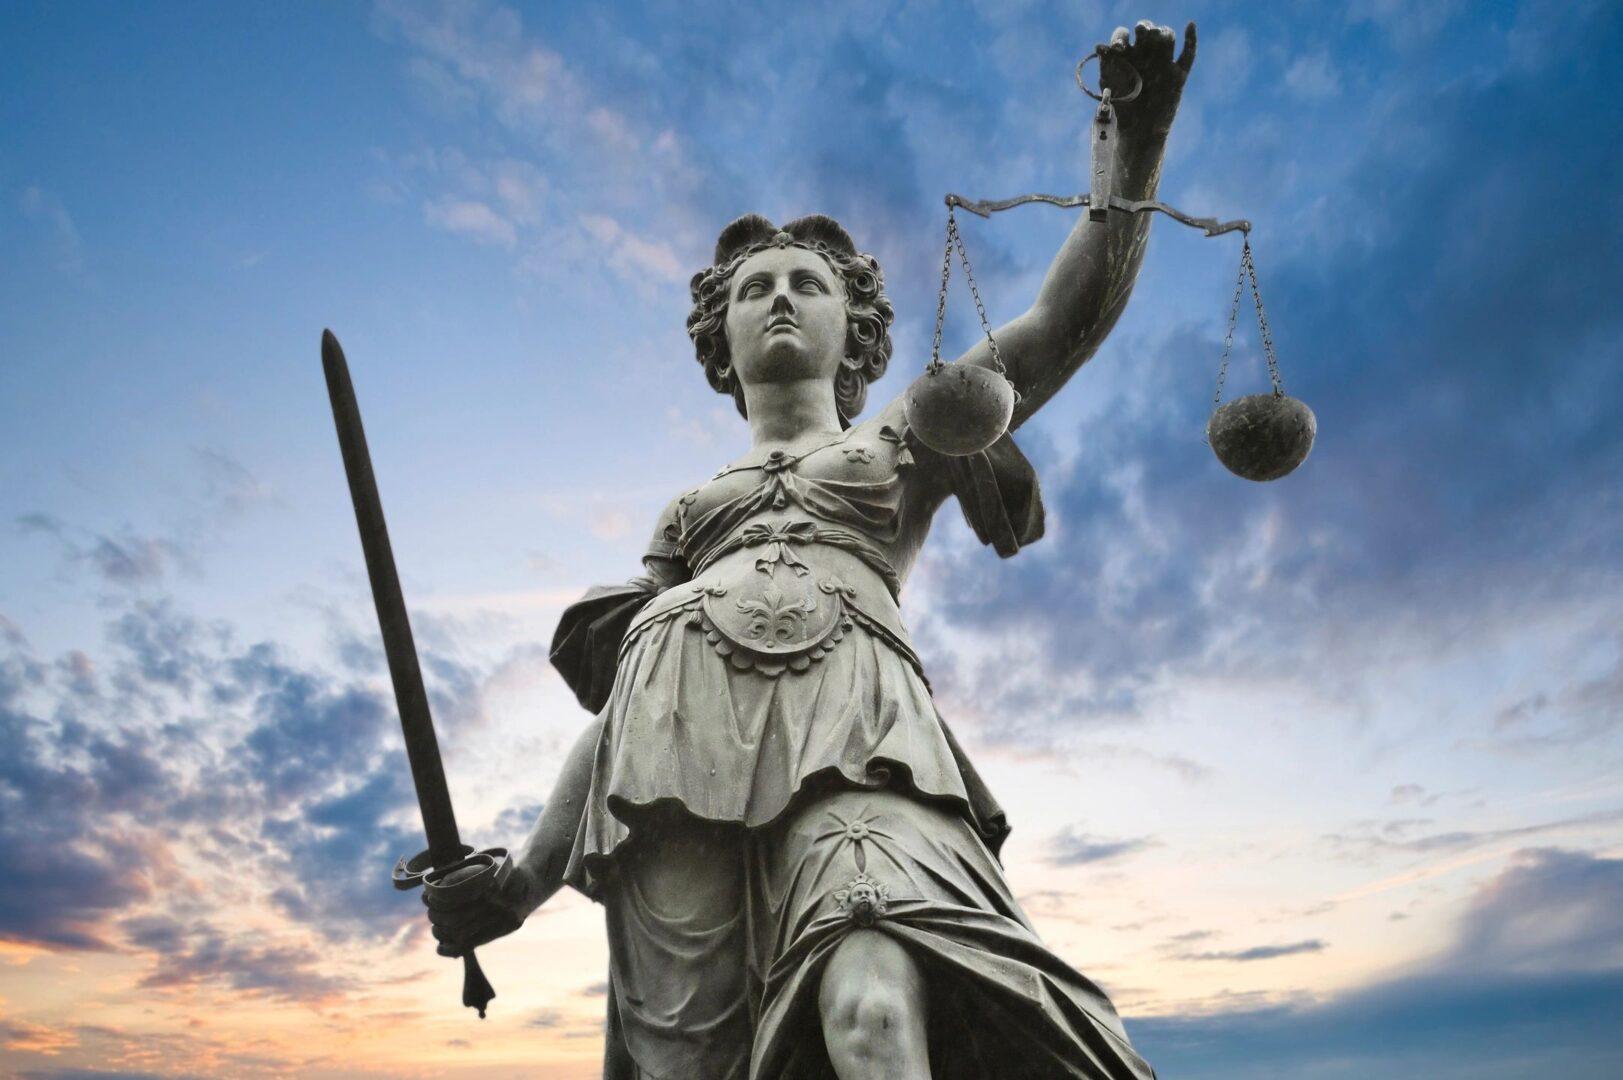 Hillin Law